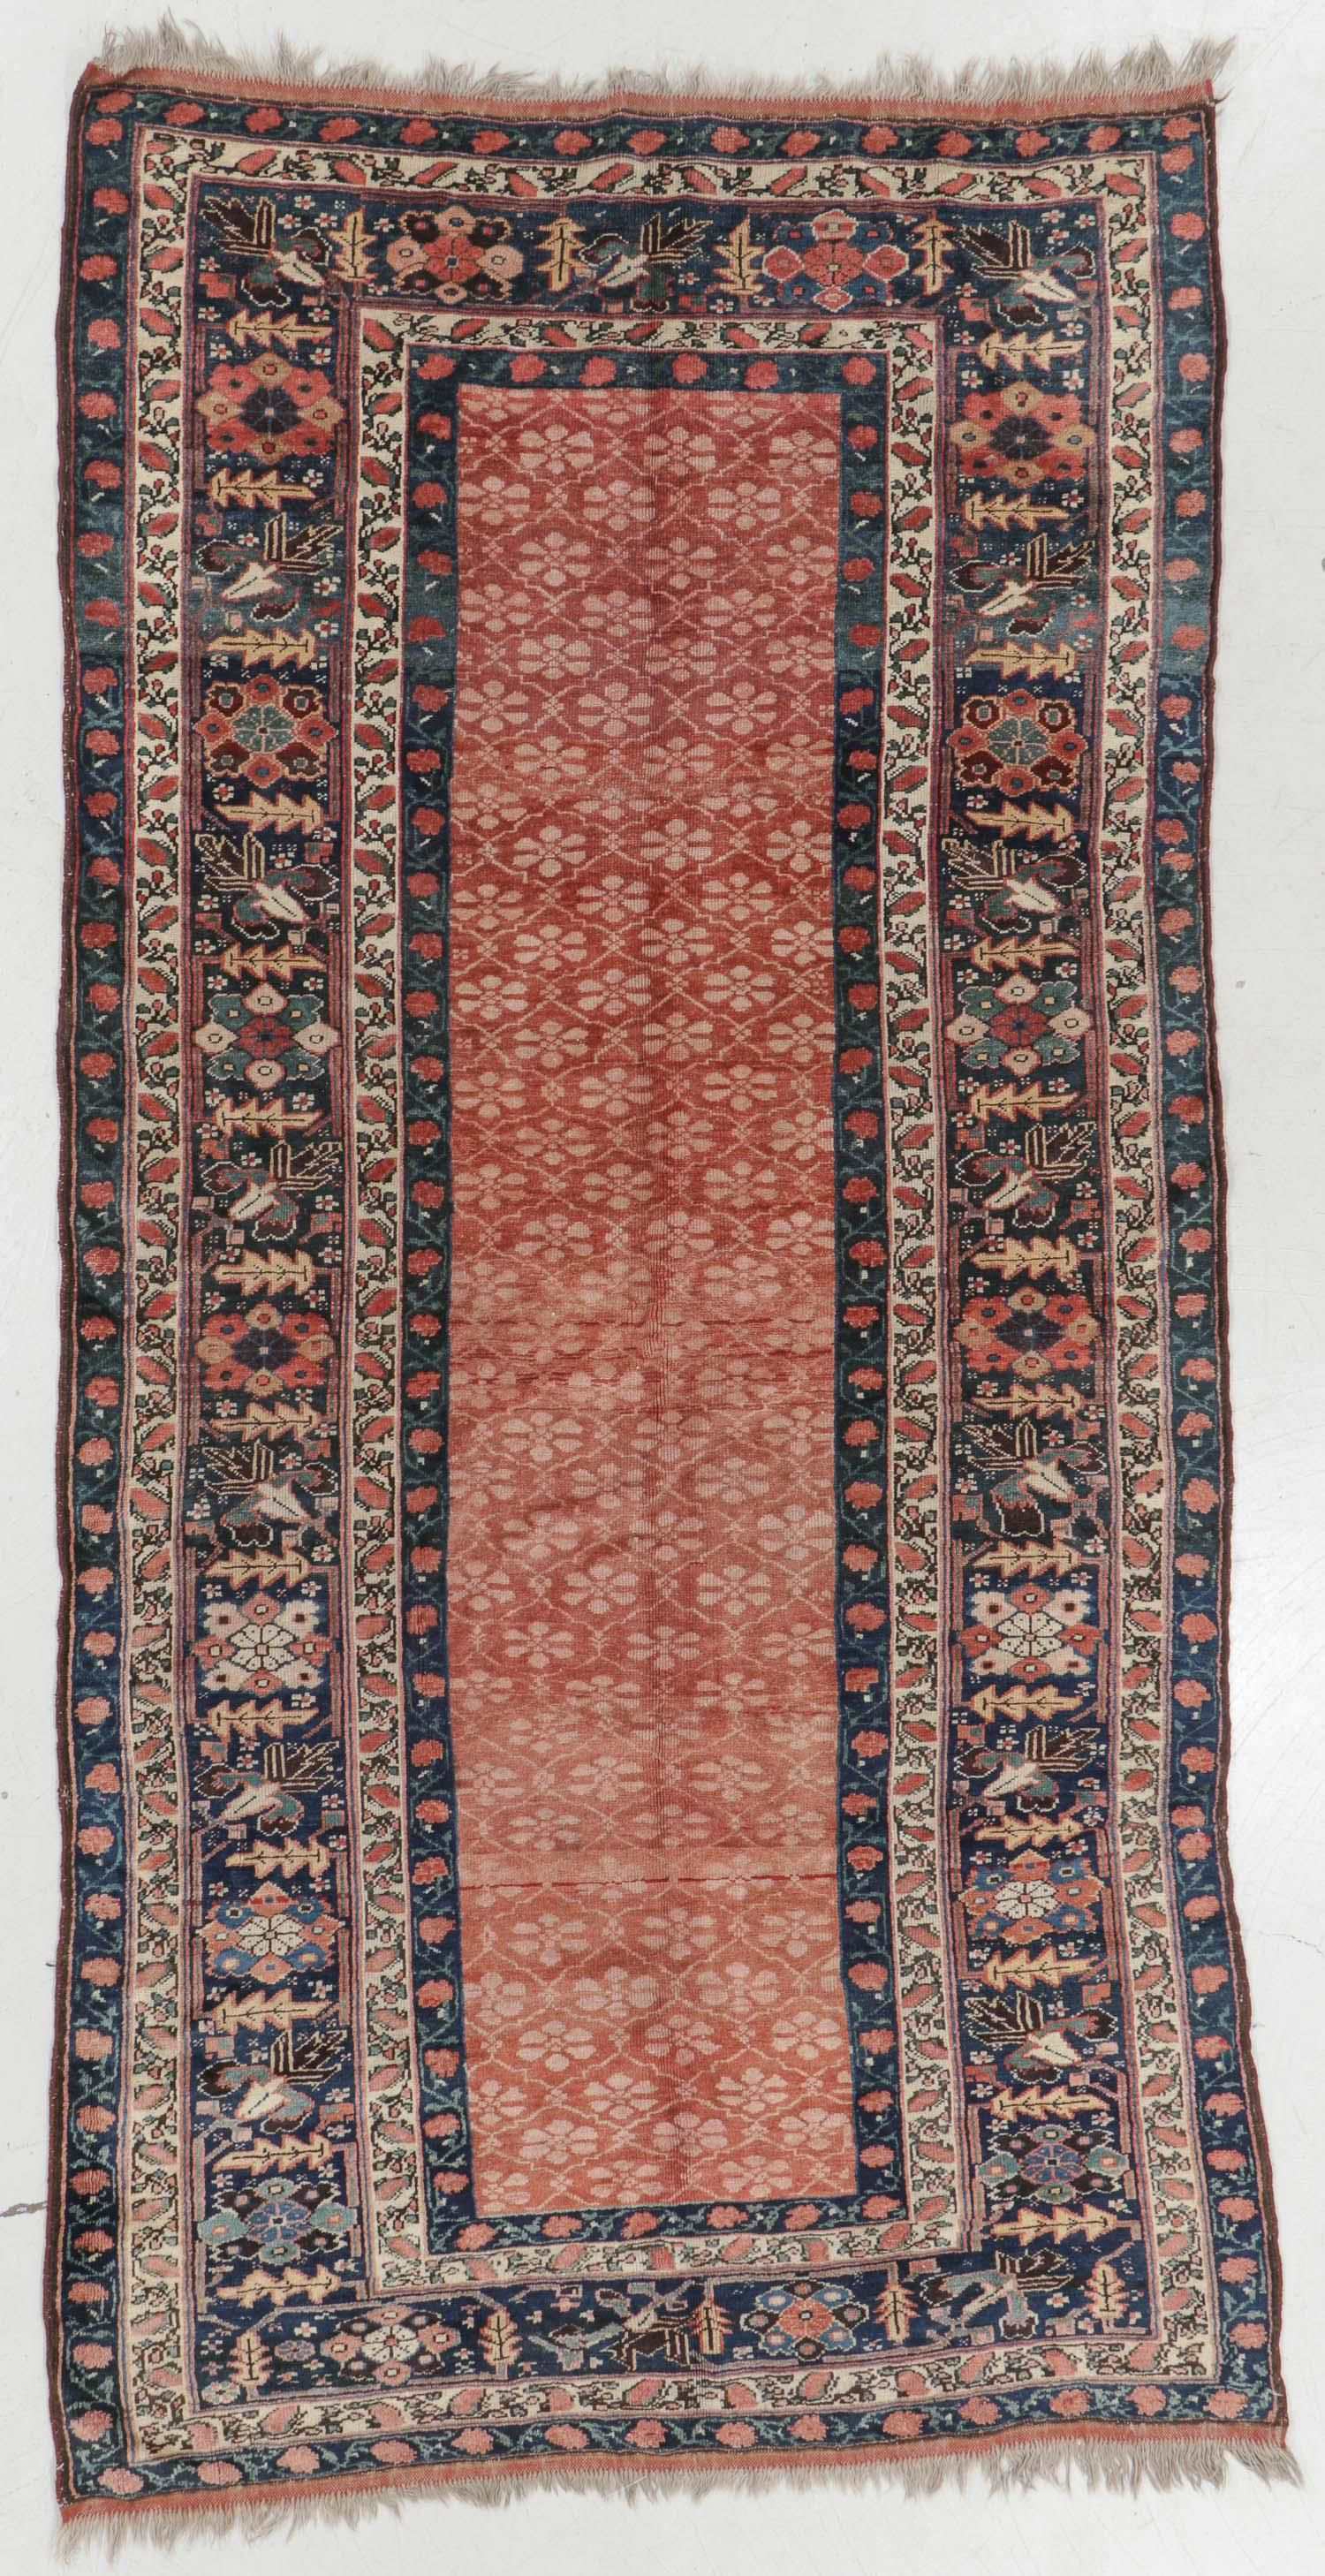 Kuba Rug, Caucasus, Circa 1880, 4'11'' x 9'9''